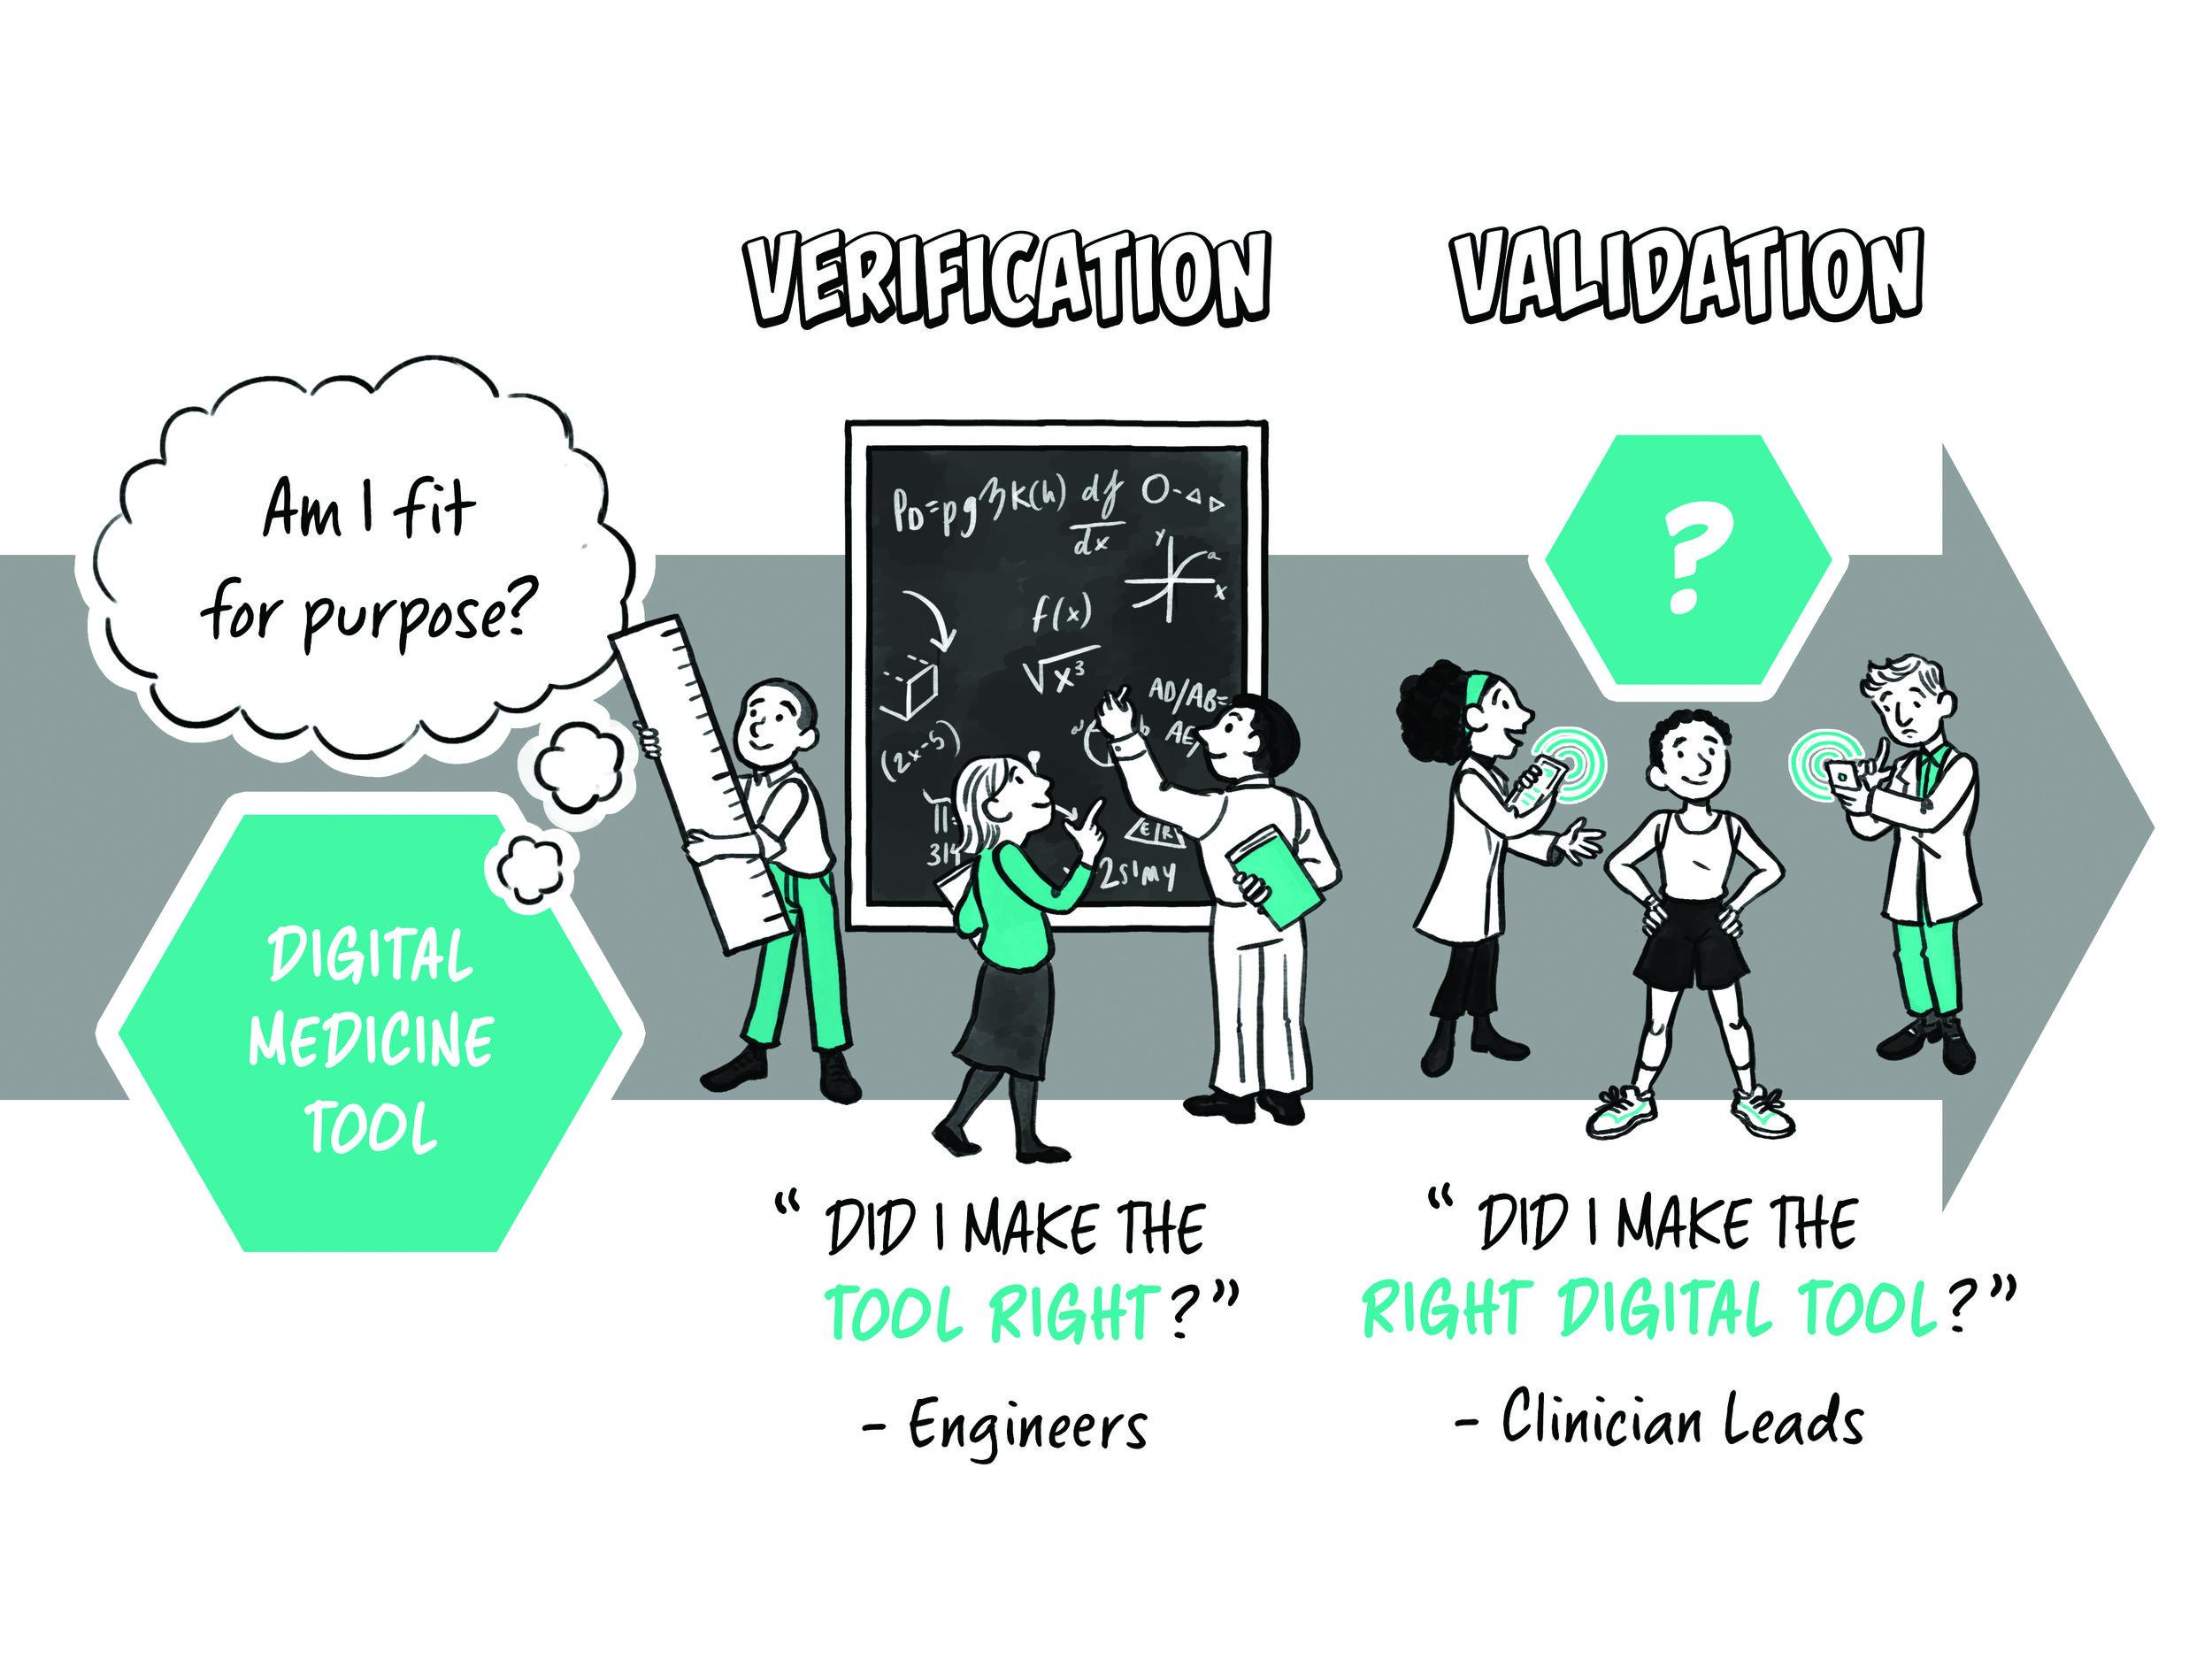 09 VERIFICATION & VALIDATION.jpg